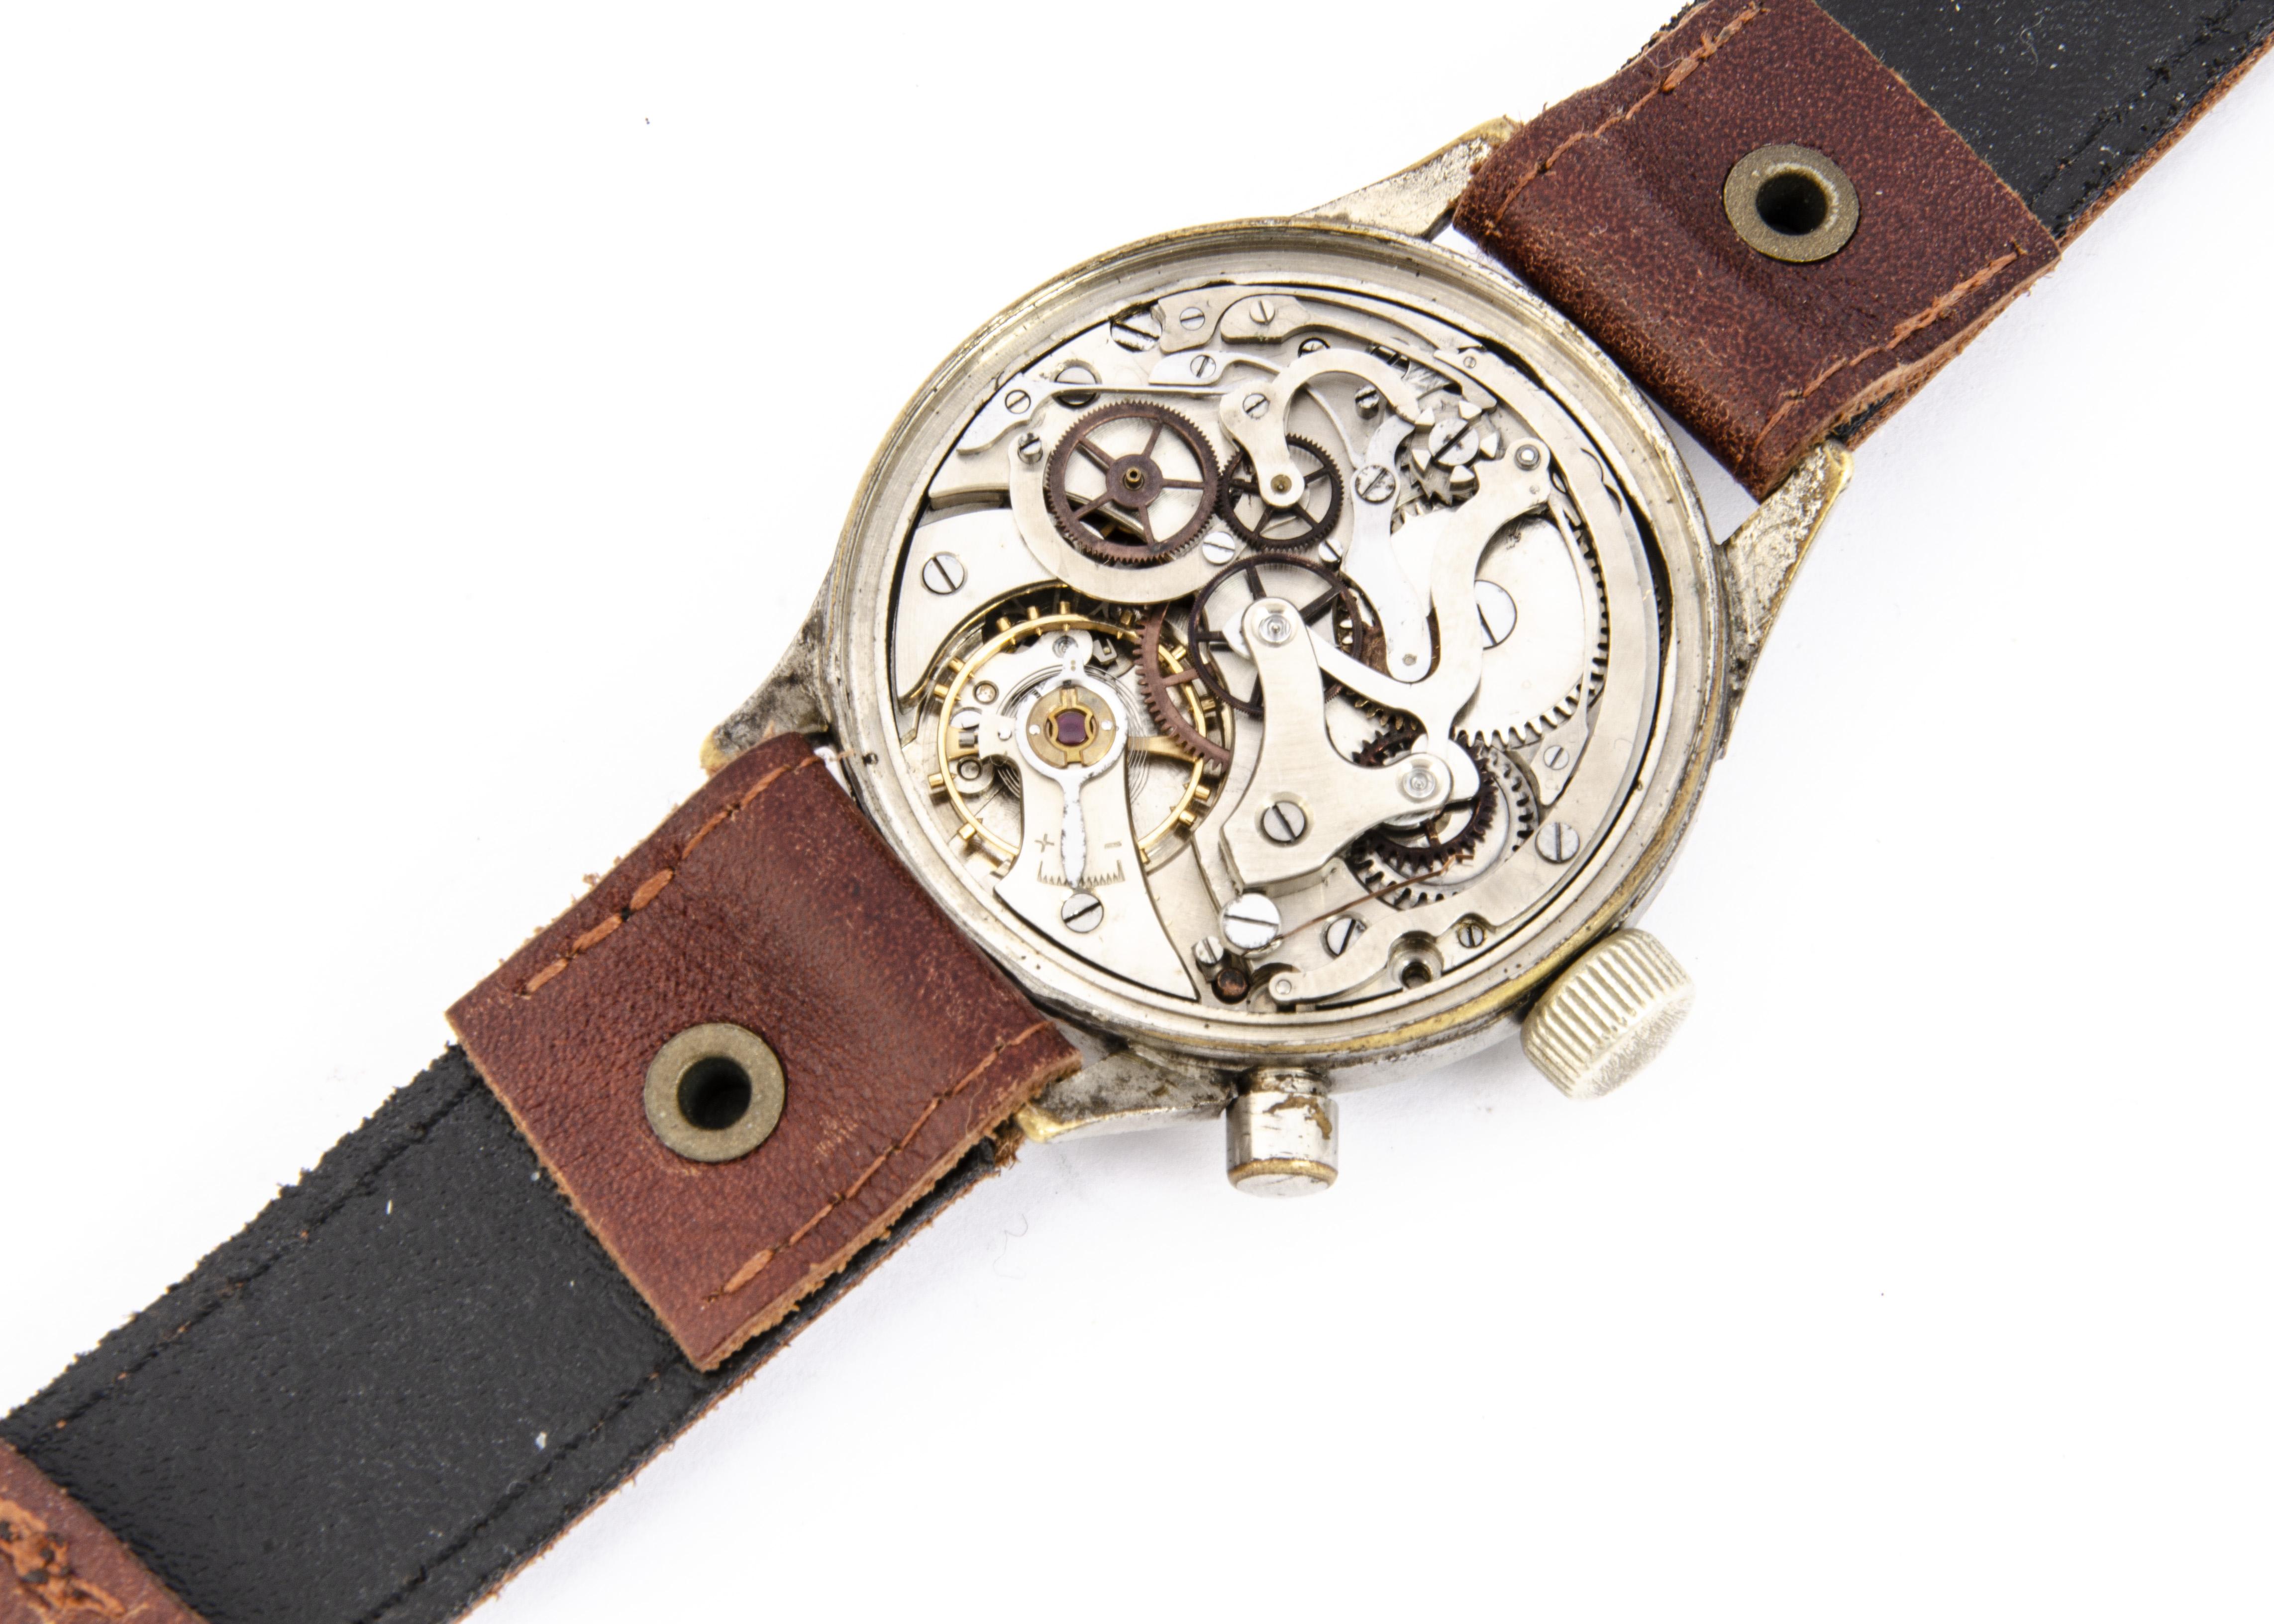 A WWII period Hanhart German Luftwaffe chronograph wristwatch, 40mm plated nickel case, running, - Image 2 of 6